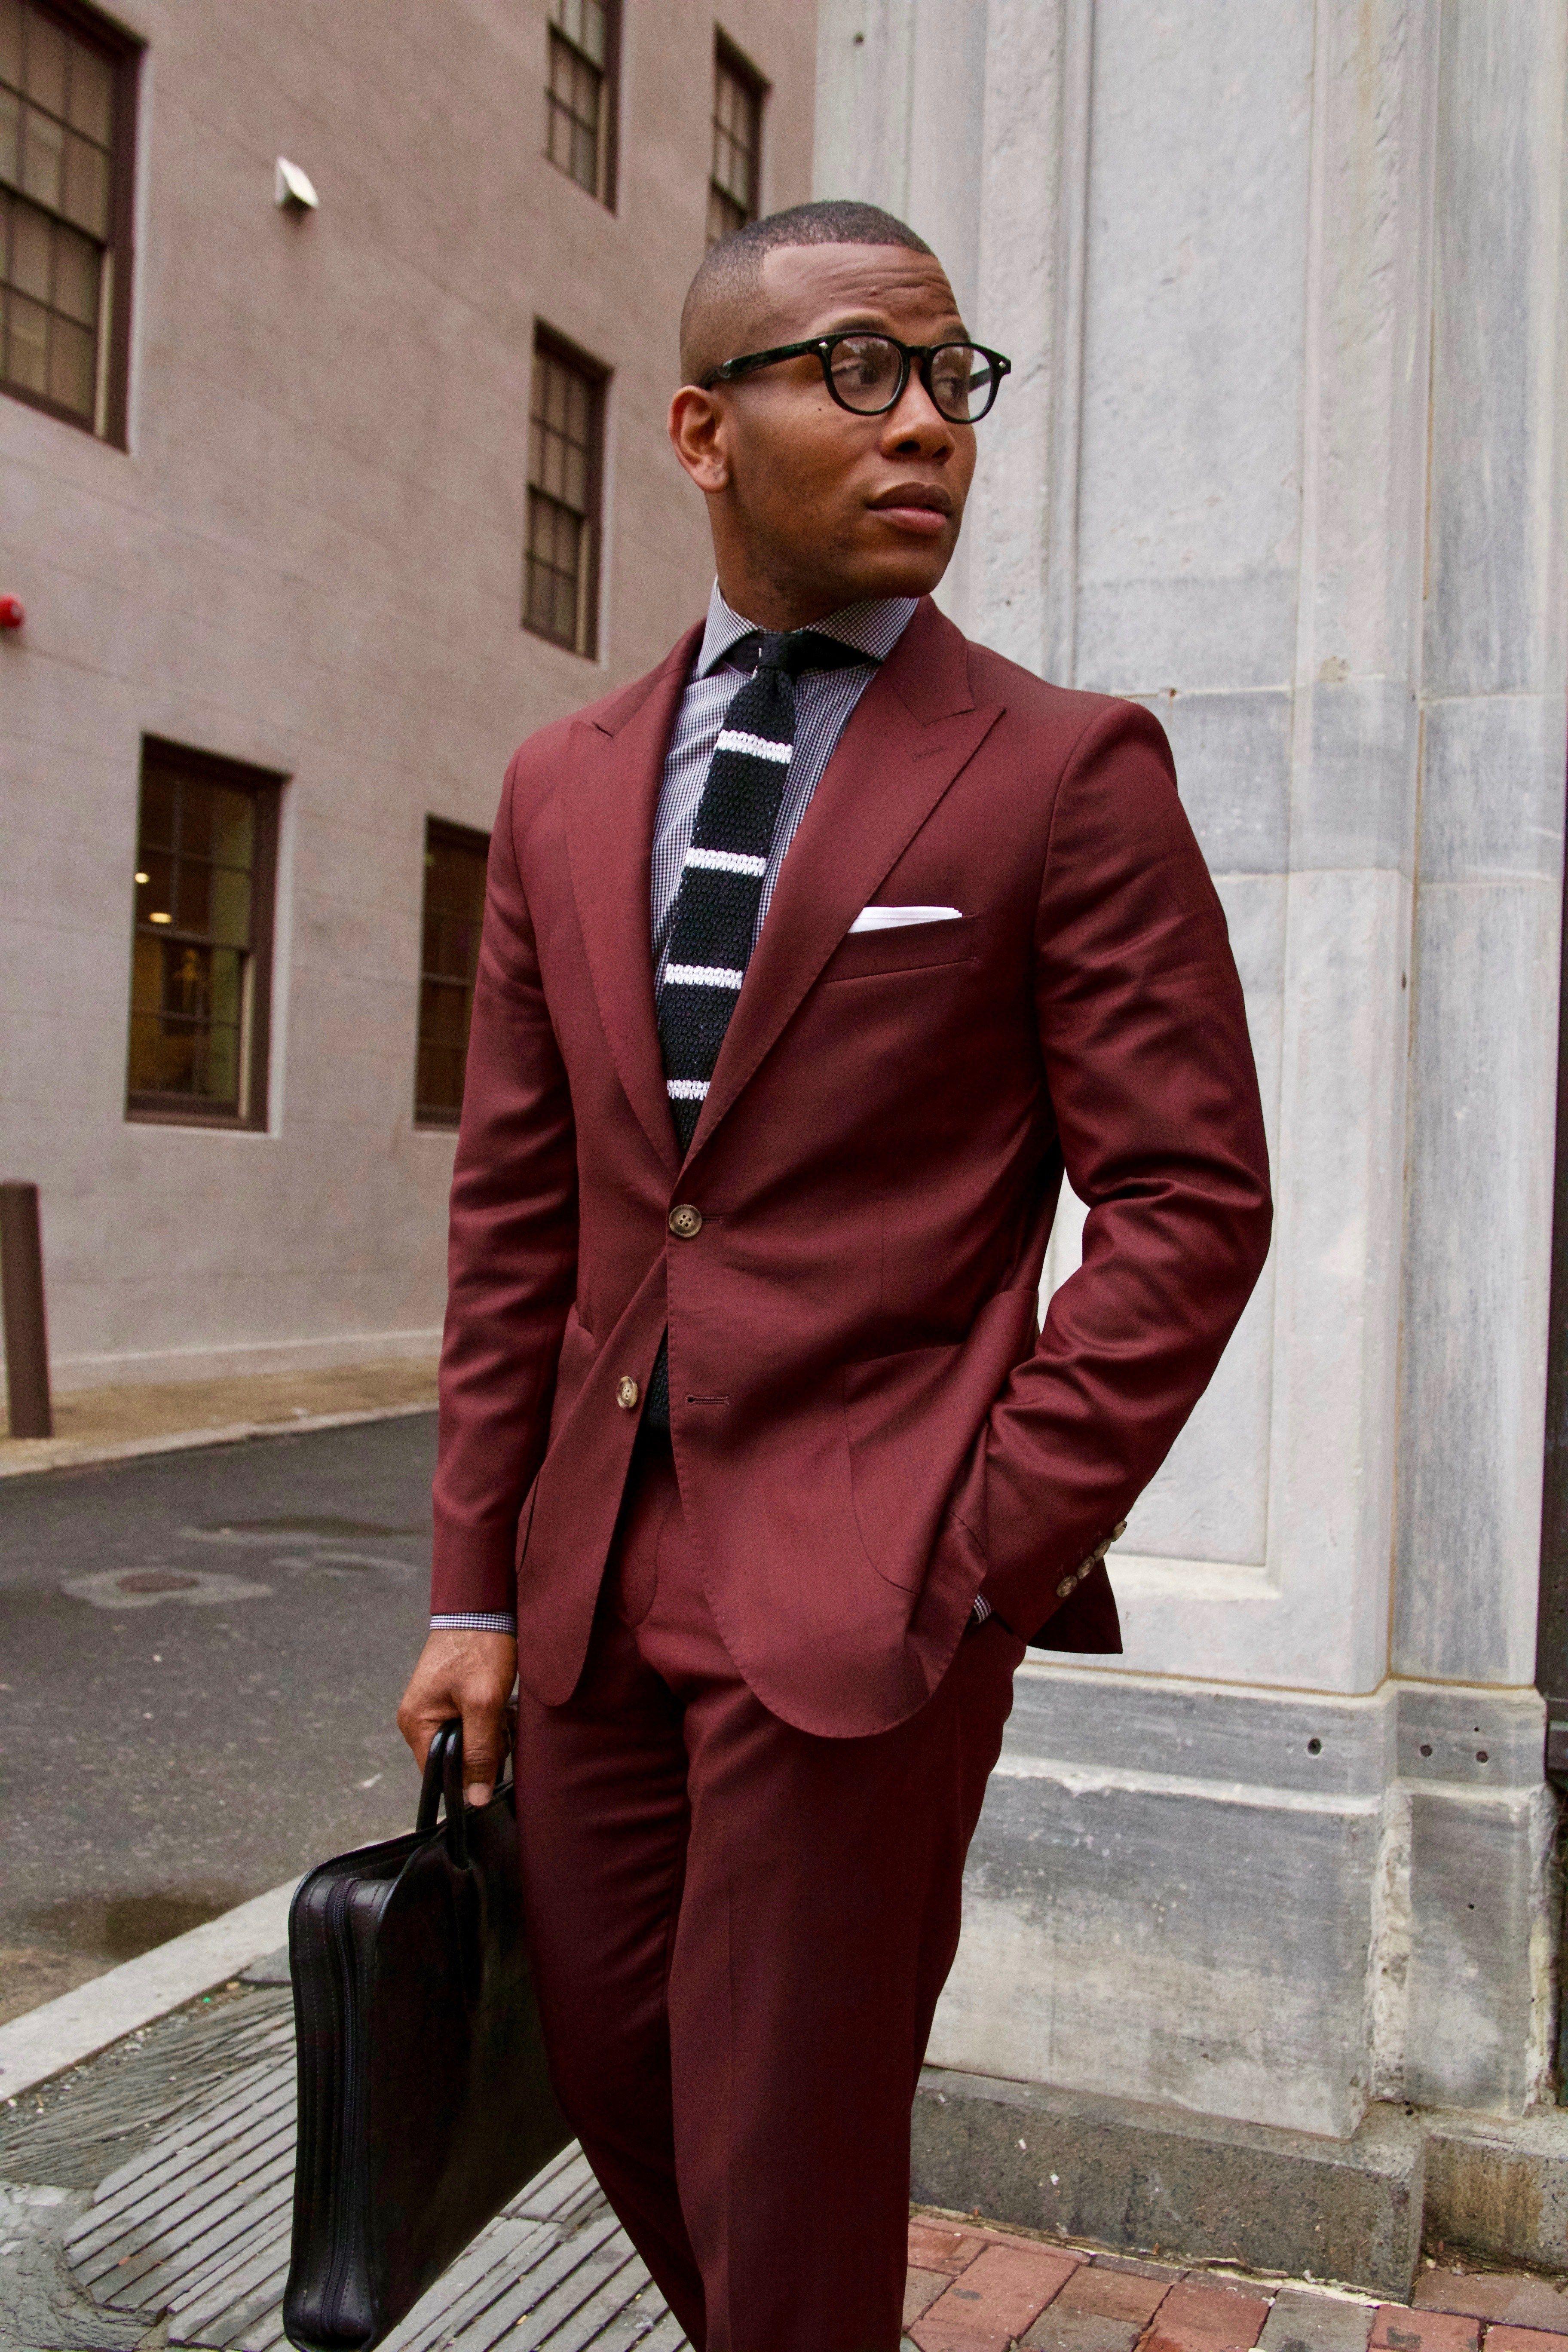 Burgundy Suit Mini Check Shirt Striped Knit Tie